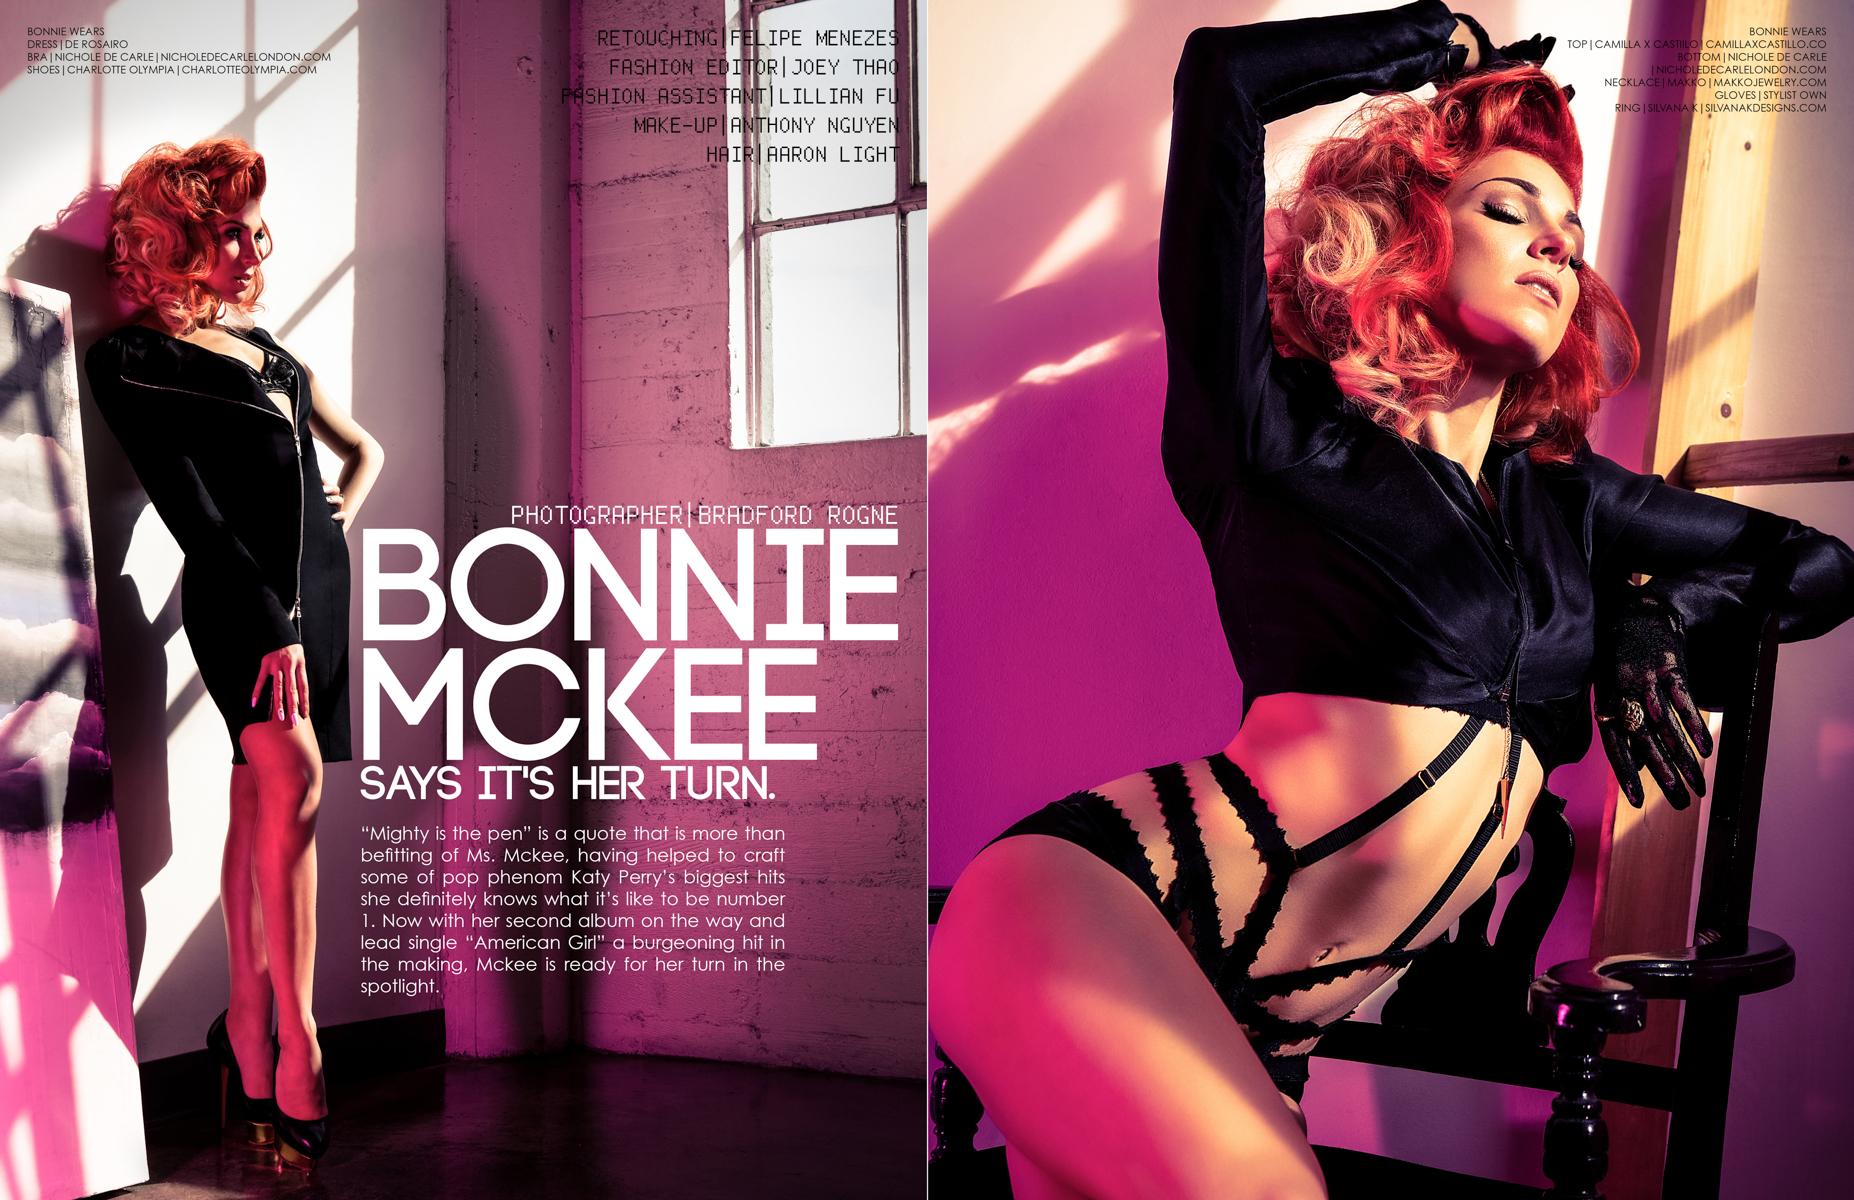 Bonnie McKee Photographed by Bradford Rogne